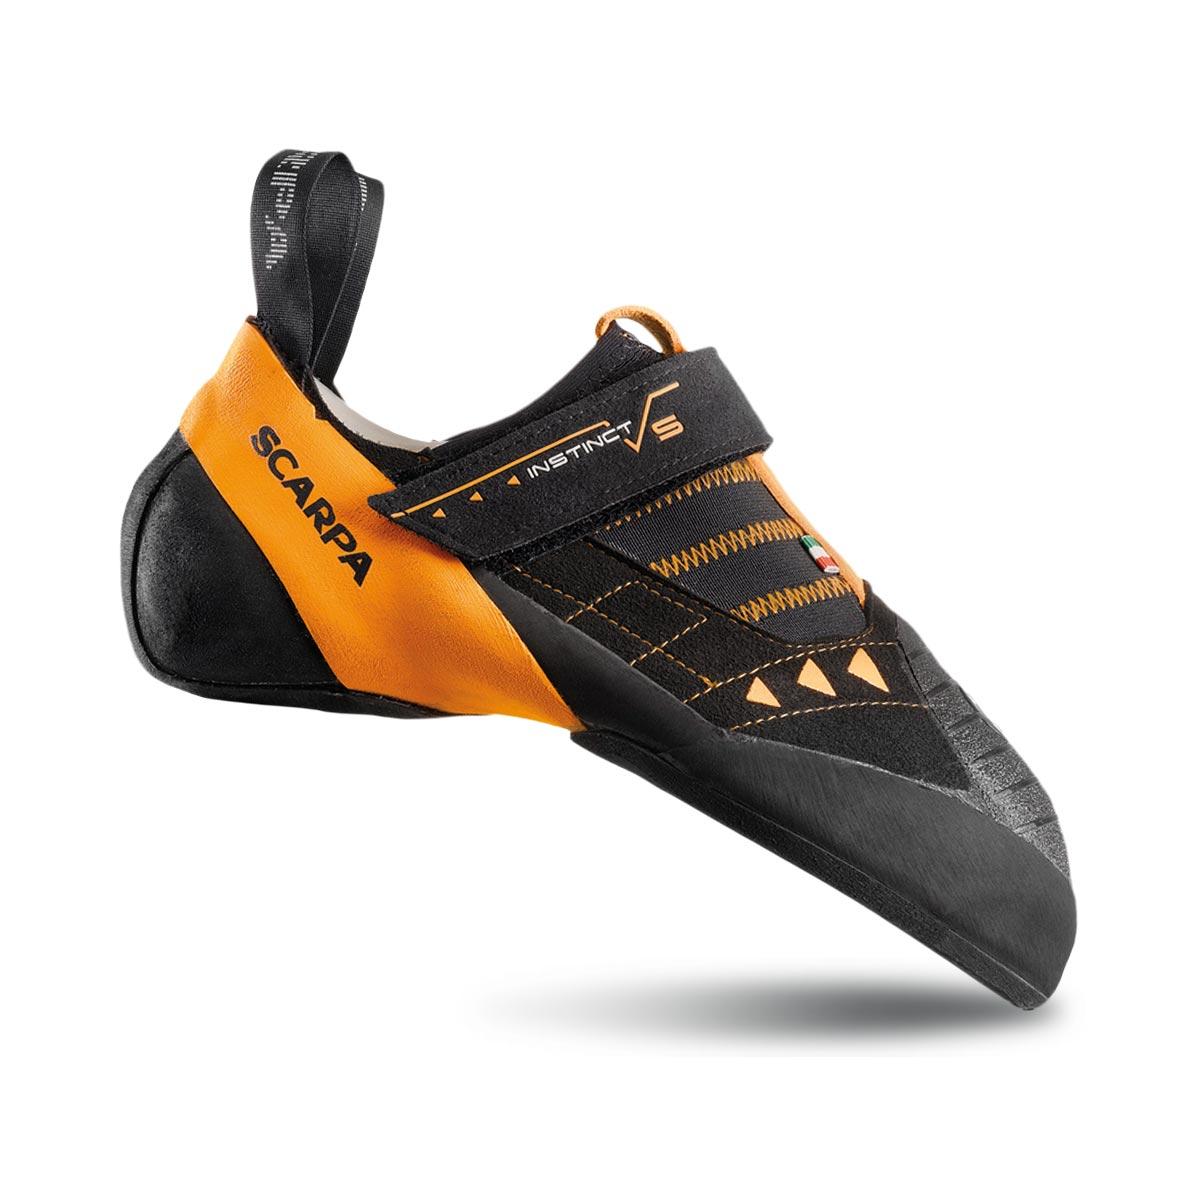 c09cf1aa6d91fc Scarpa Instinct VS Climbing Shoe